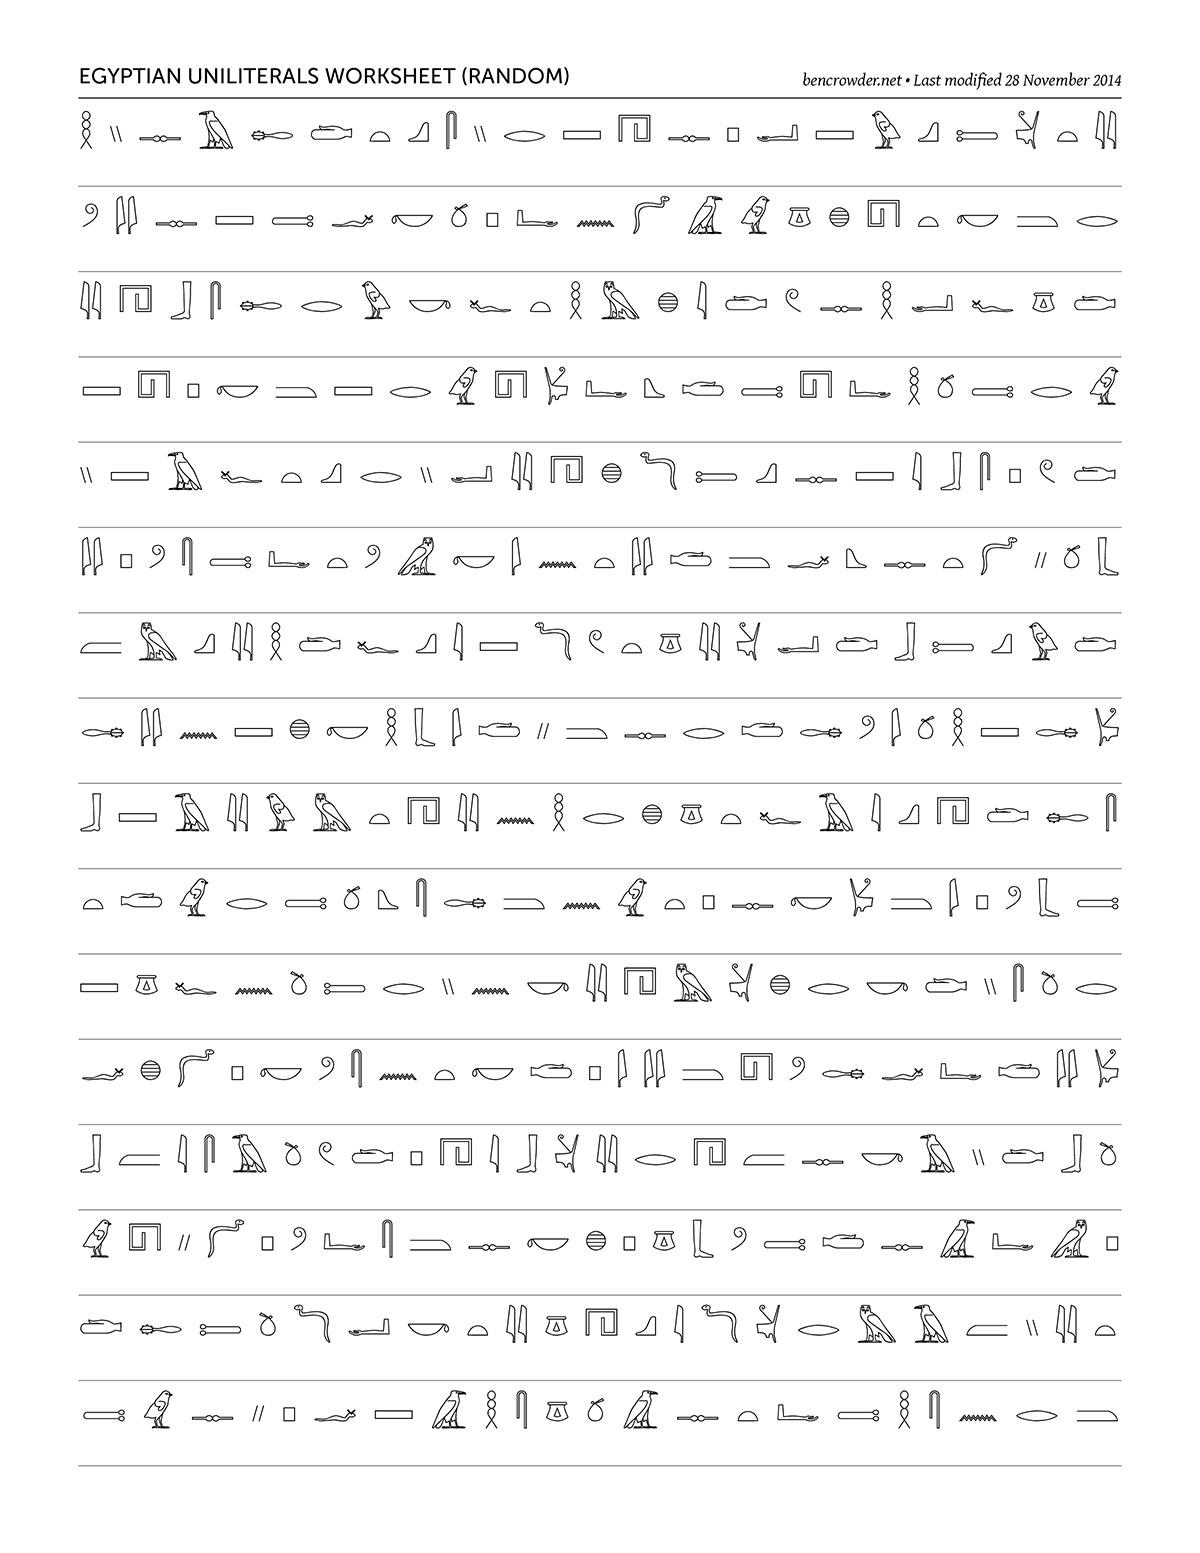 Egyptian Uniliterals Random Worksheet